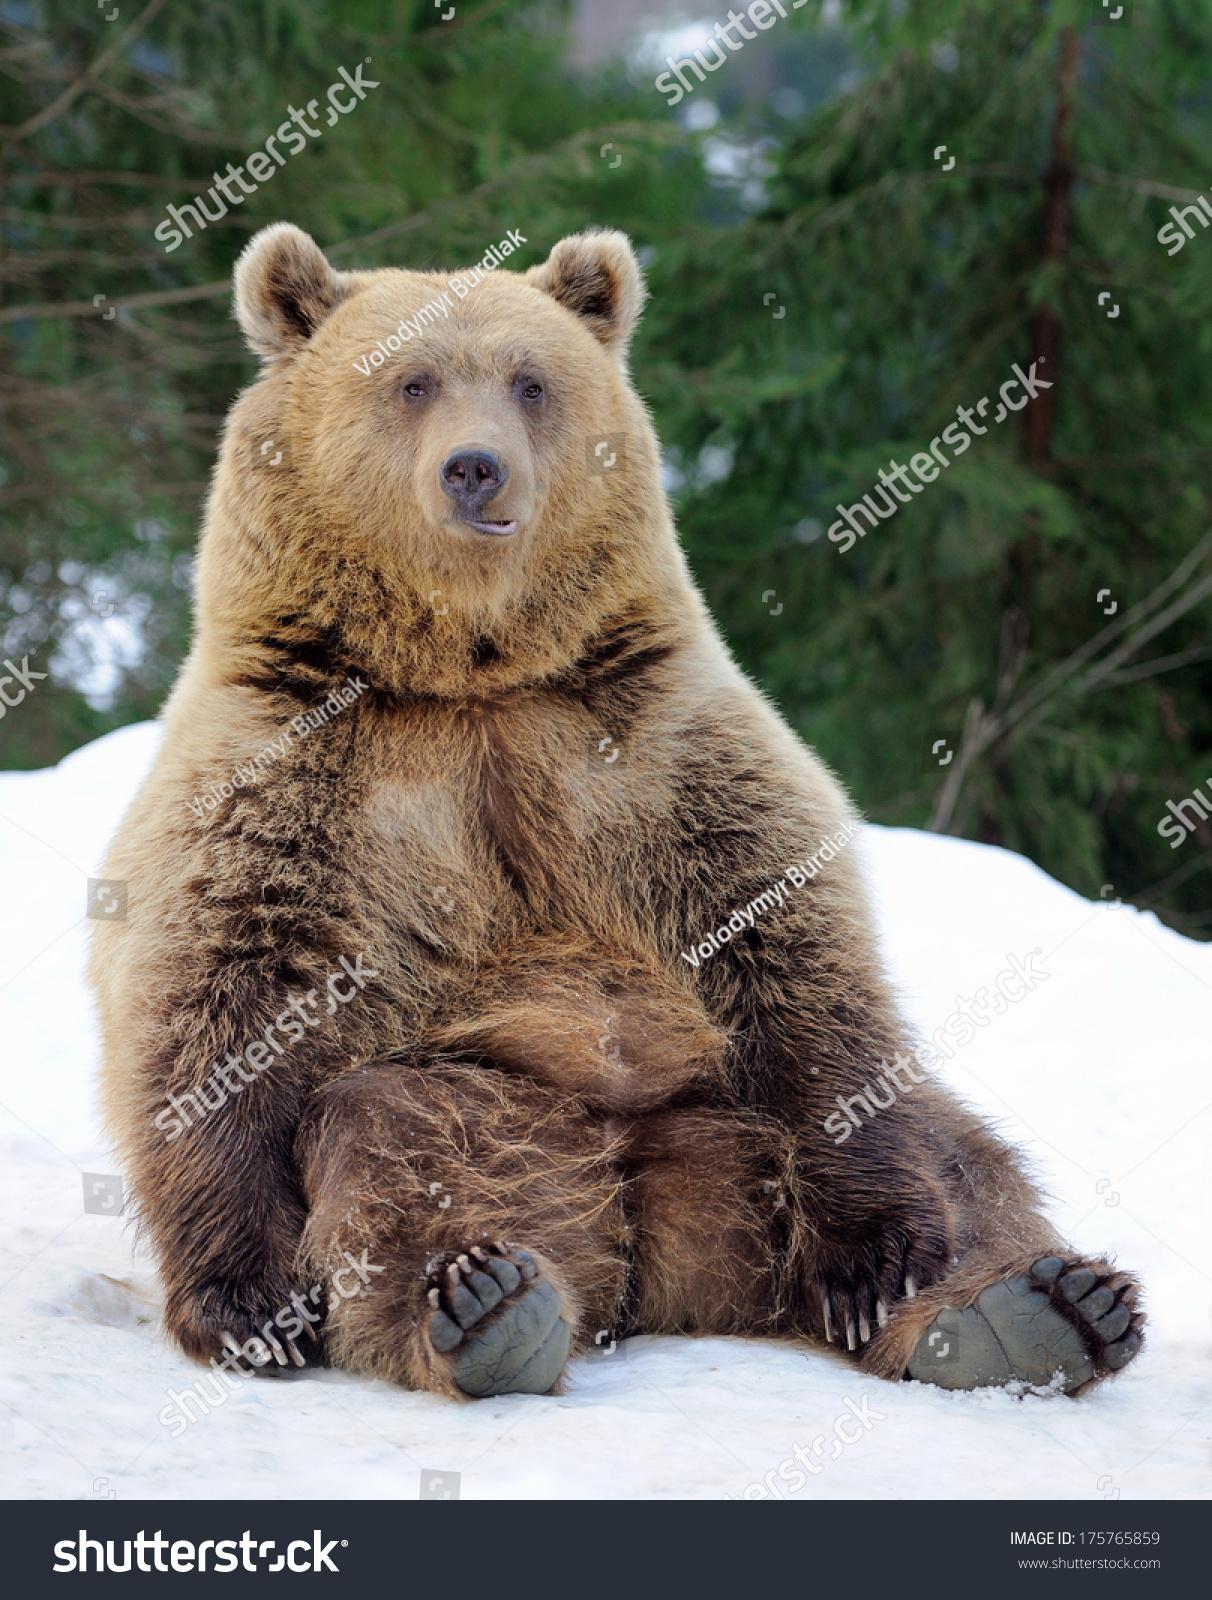 bear winter forest stock photo 175765859 shutterstock. Black Bedroom Furniture Sets. Home Design Ideas